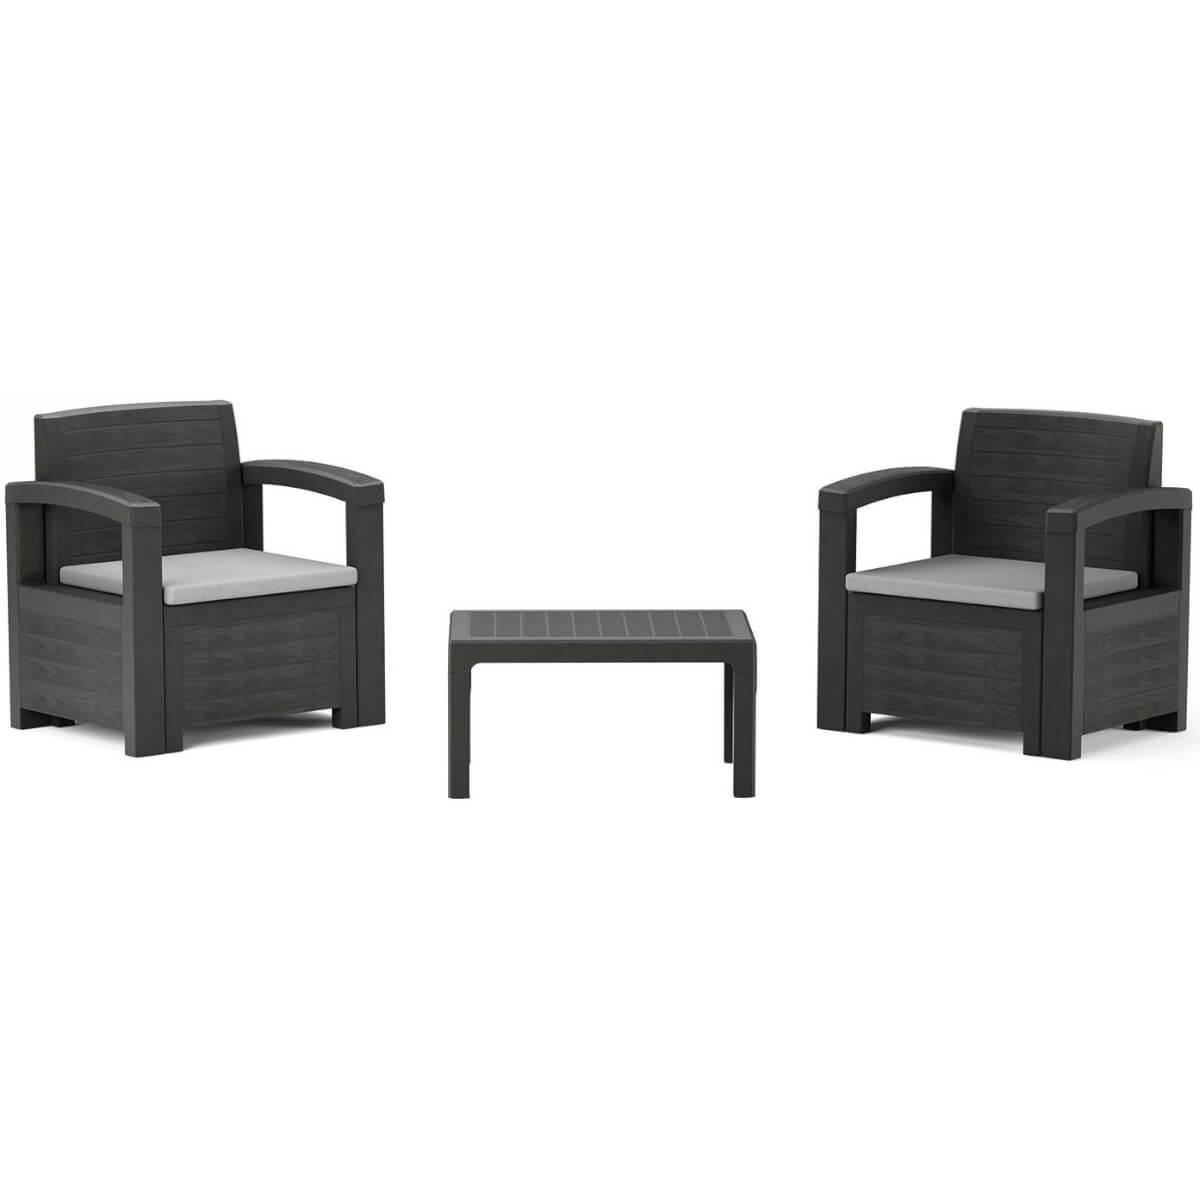 Комплект мебели Rattan Comfort 3